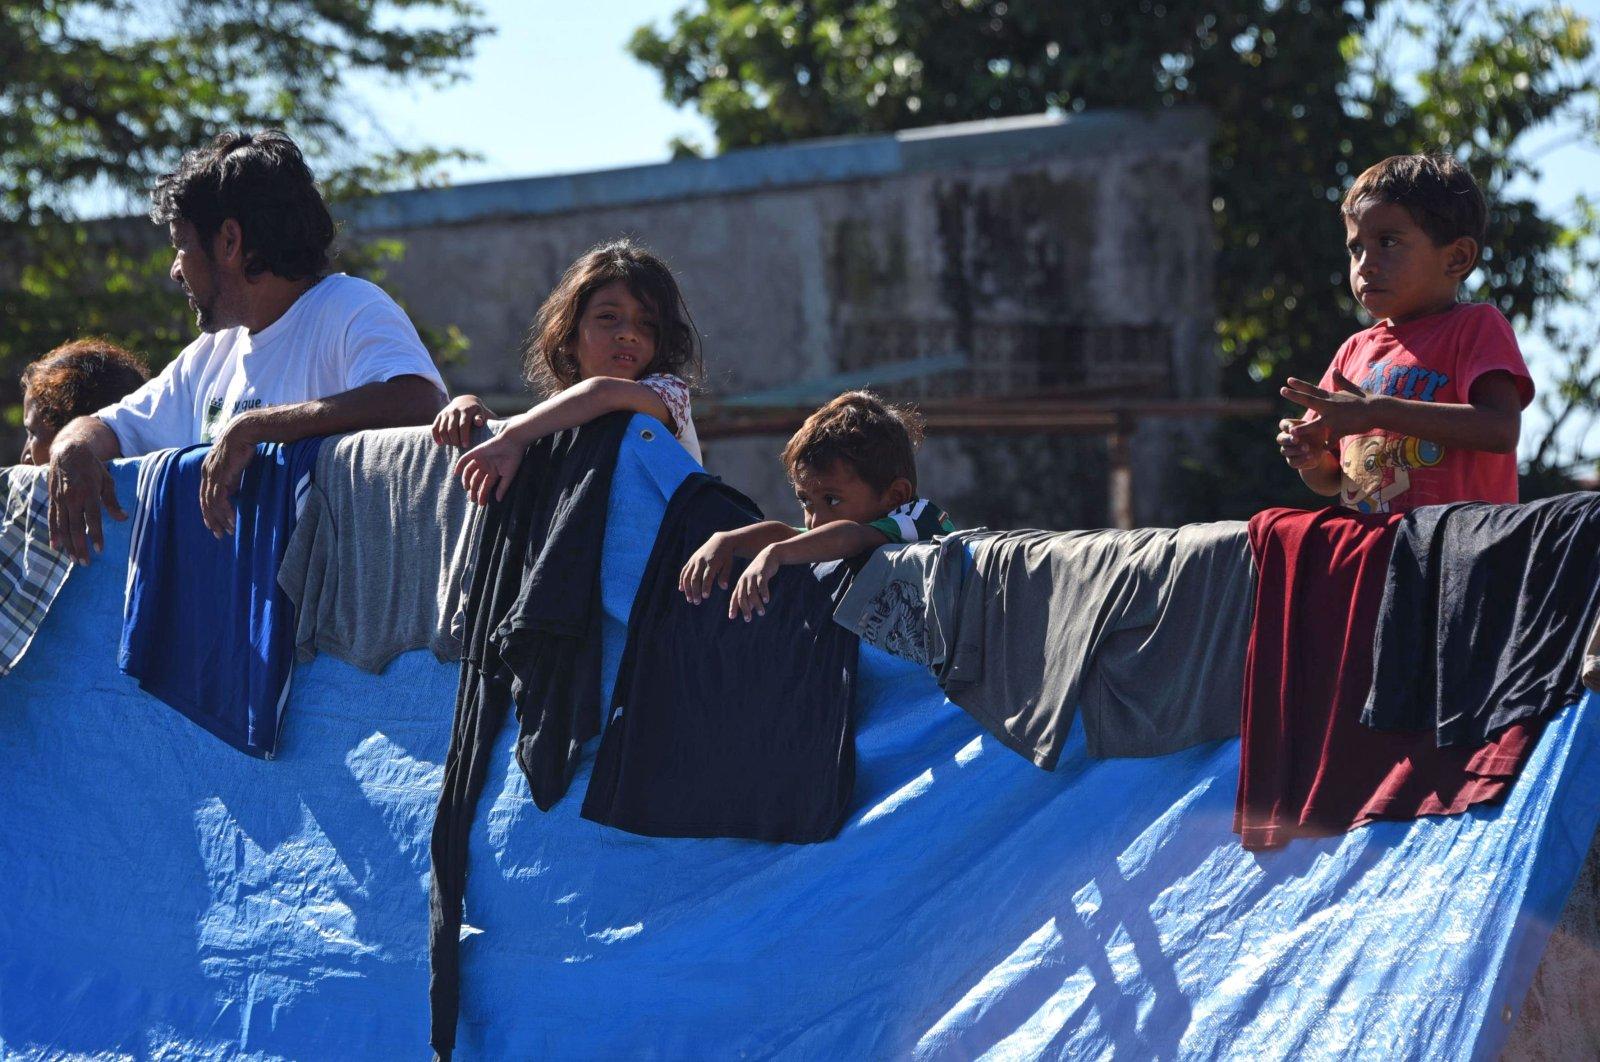 Honduran migrants taking part in a caravan heading to the U.S. camp, Huixtla, Chiapas State, Mexico, Oct. 23, 2018. (AFP Photo)